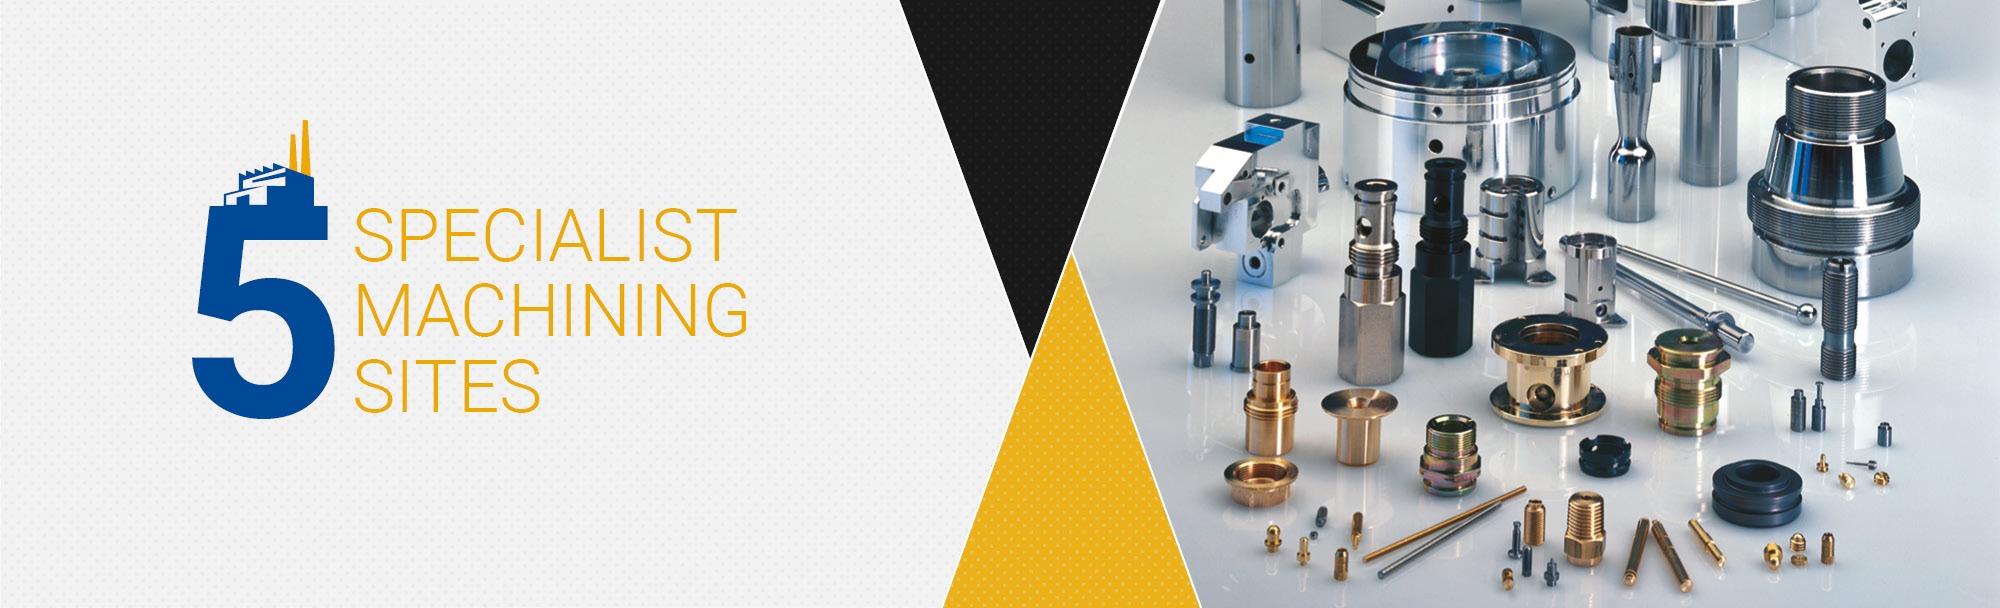 CNC MACHINING SERVICES UK